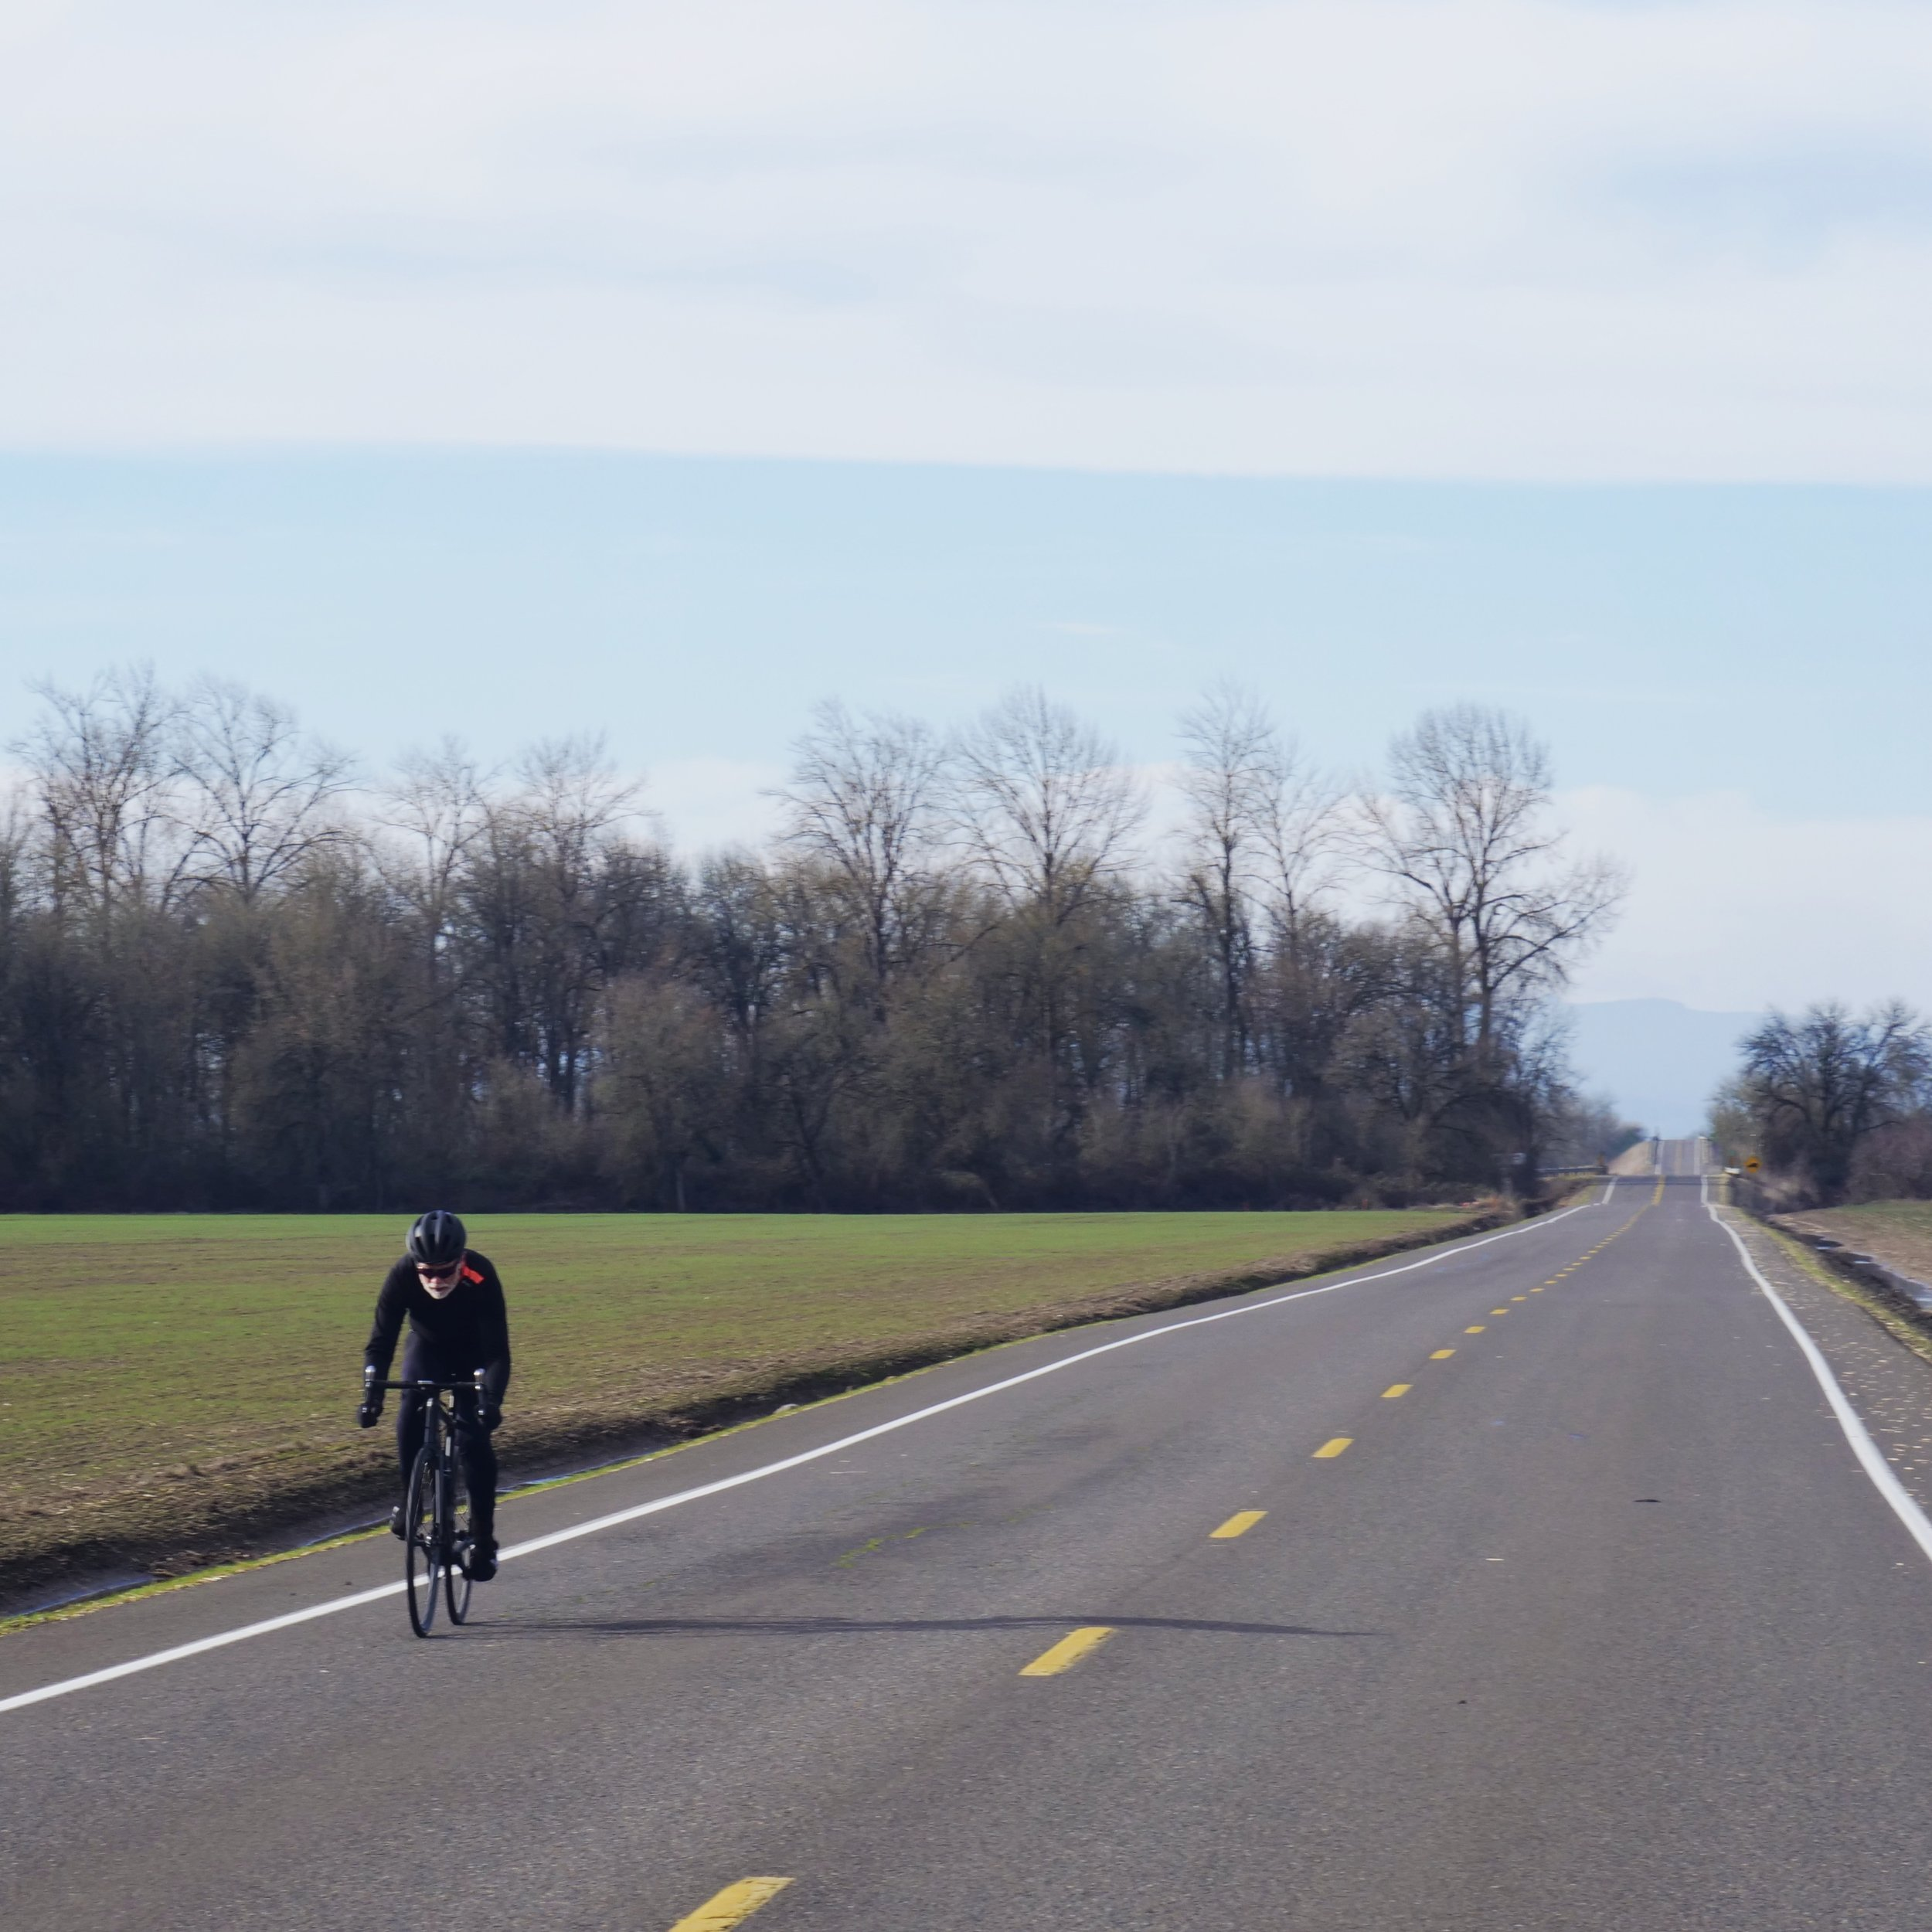 sykkel lang vei.jpeg